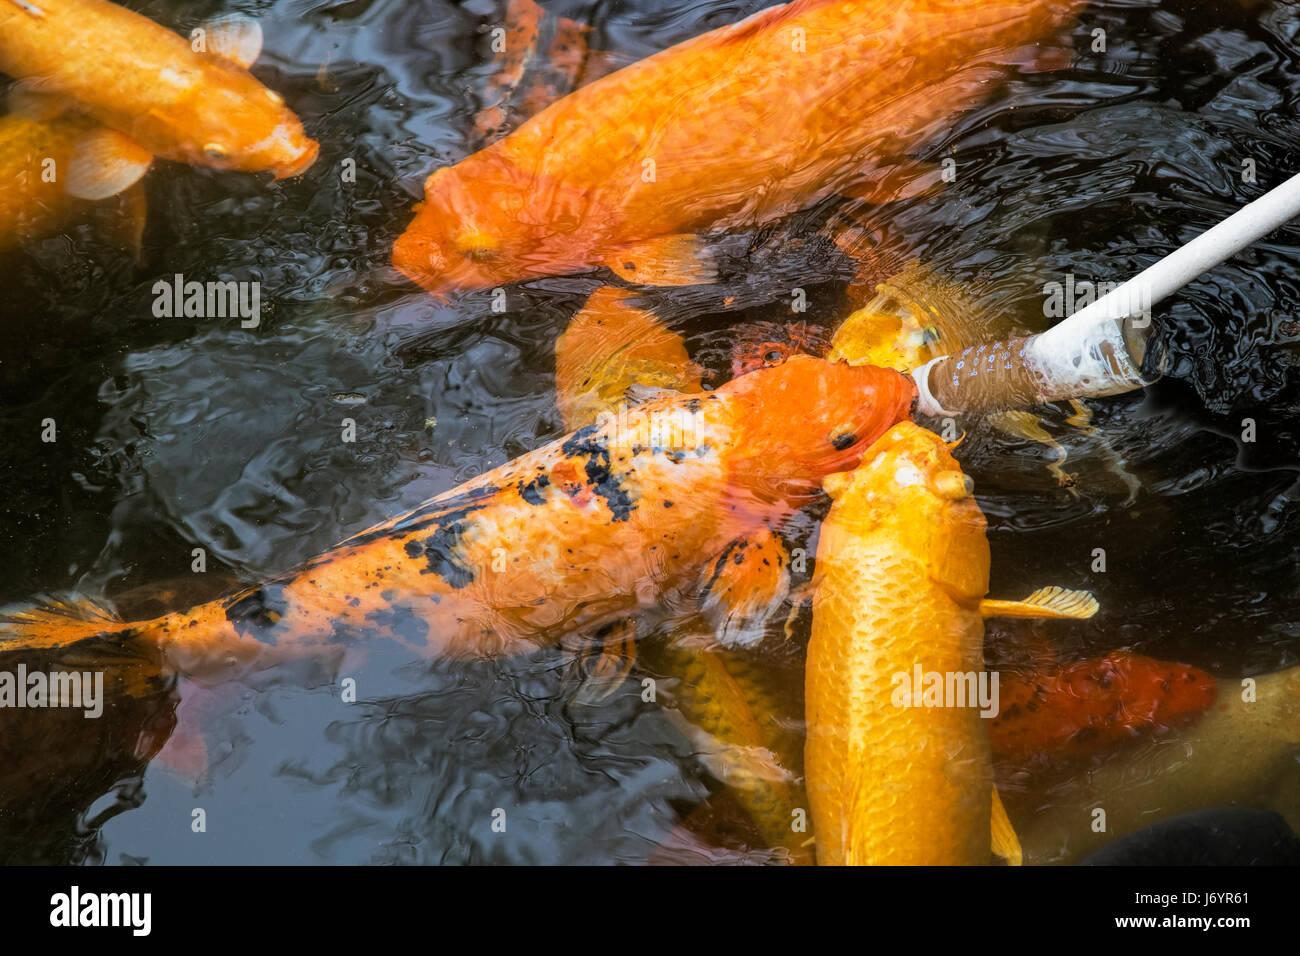 Goldfish pond china stock photos goldfish pond china for What to feed baby koi